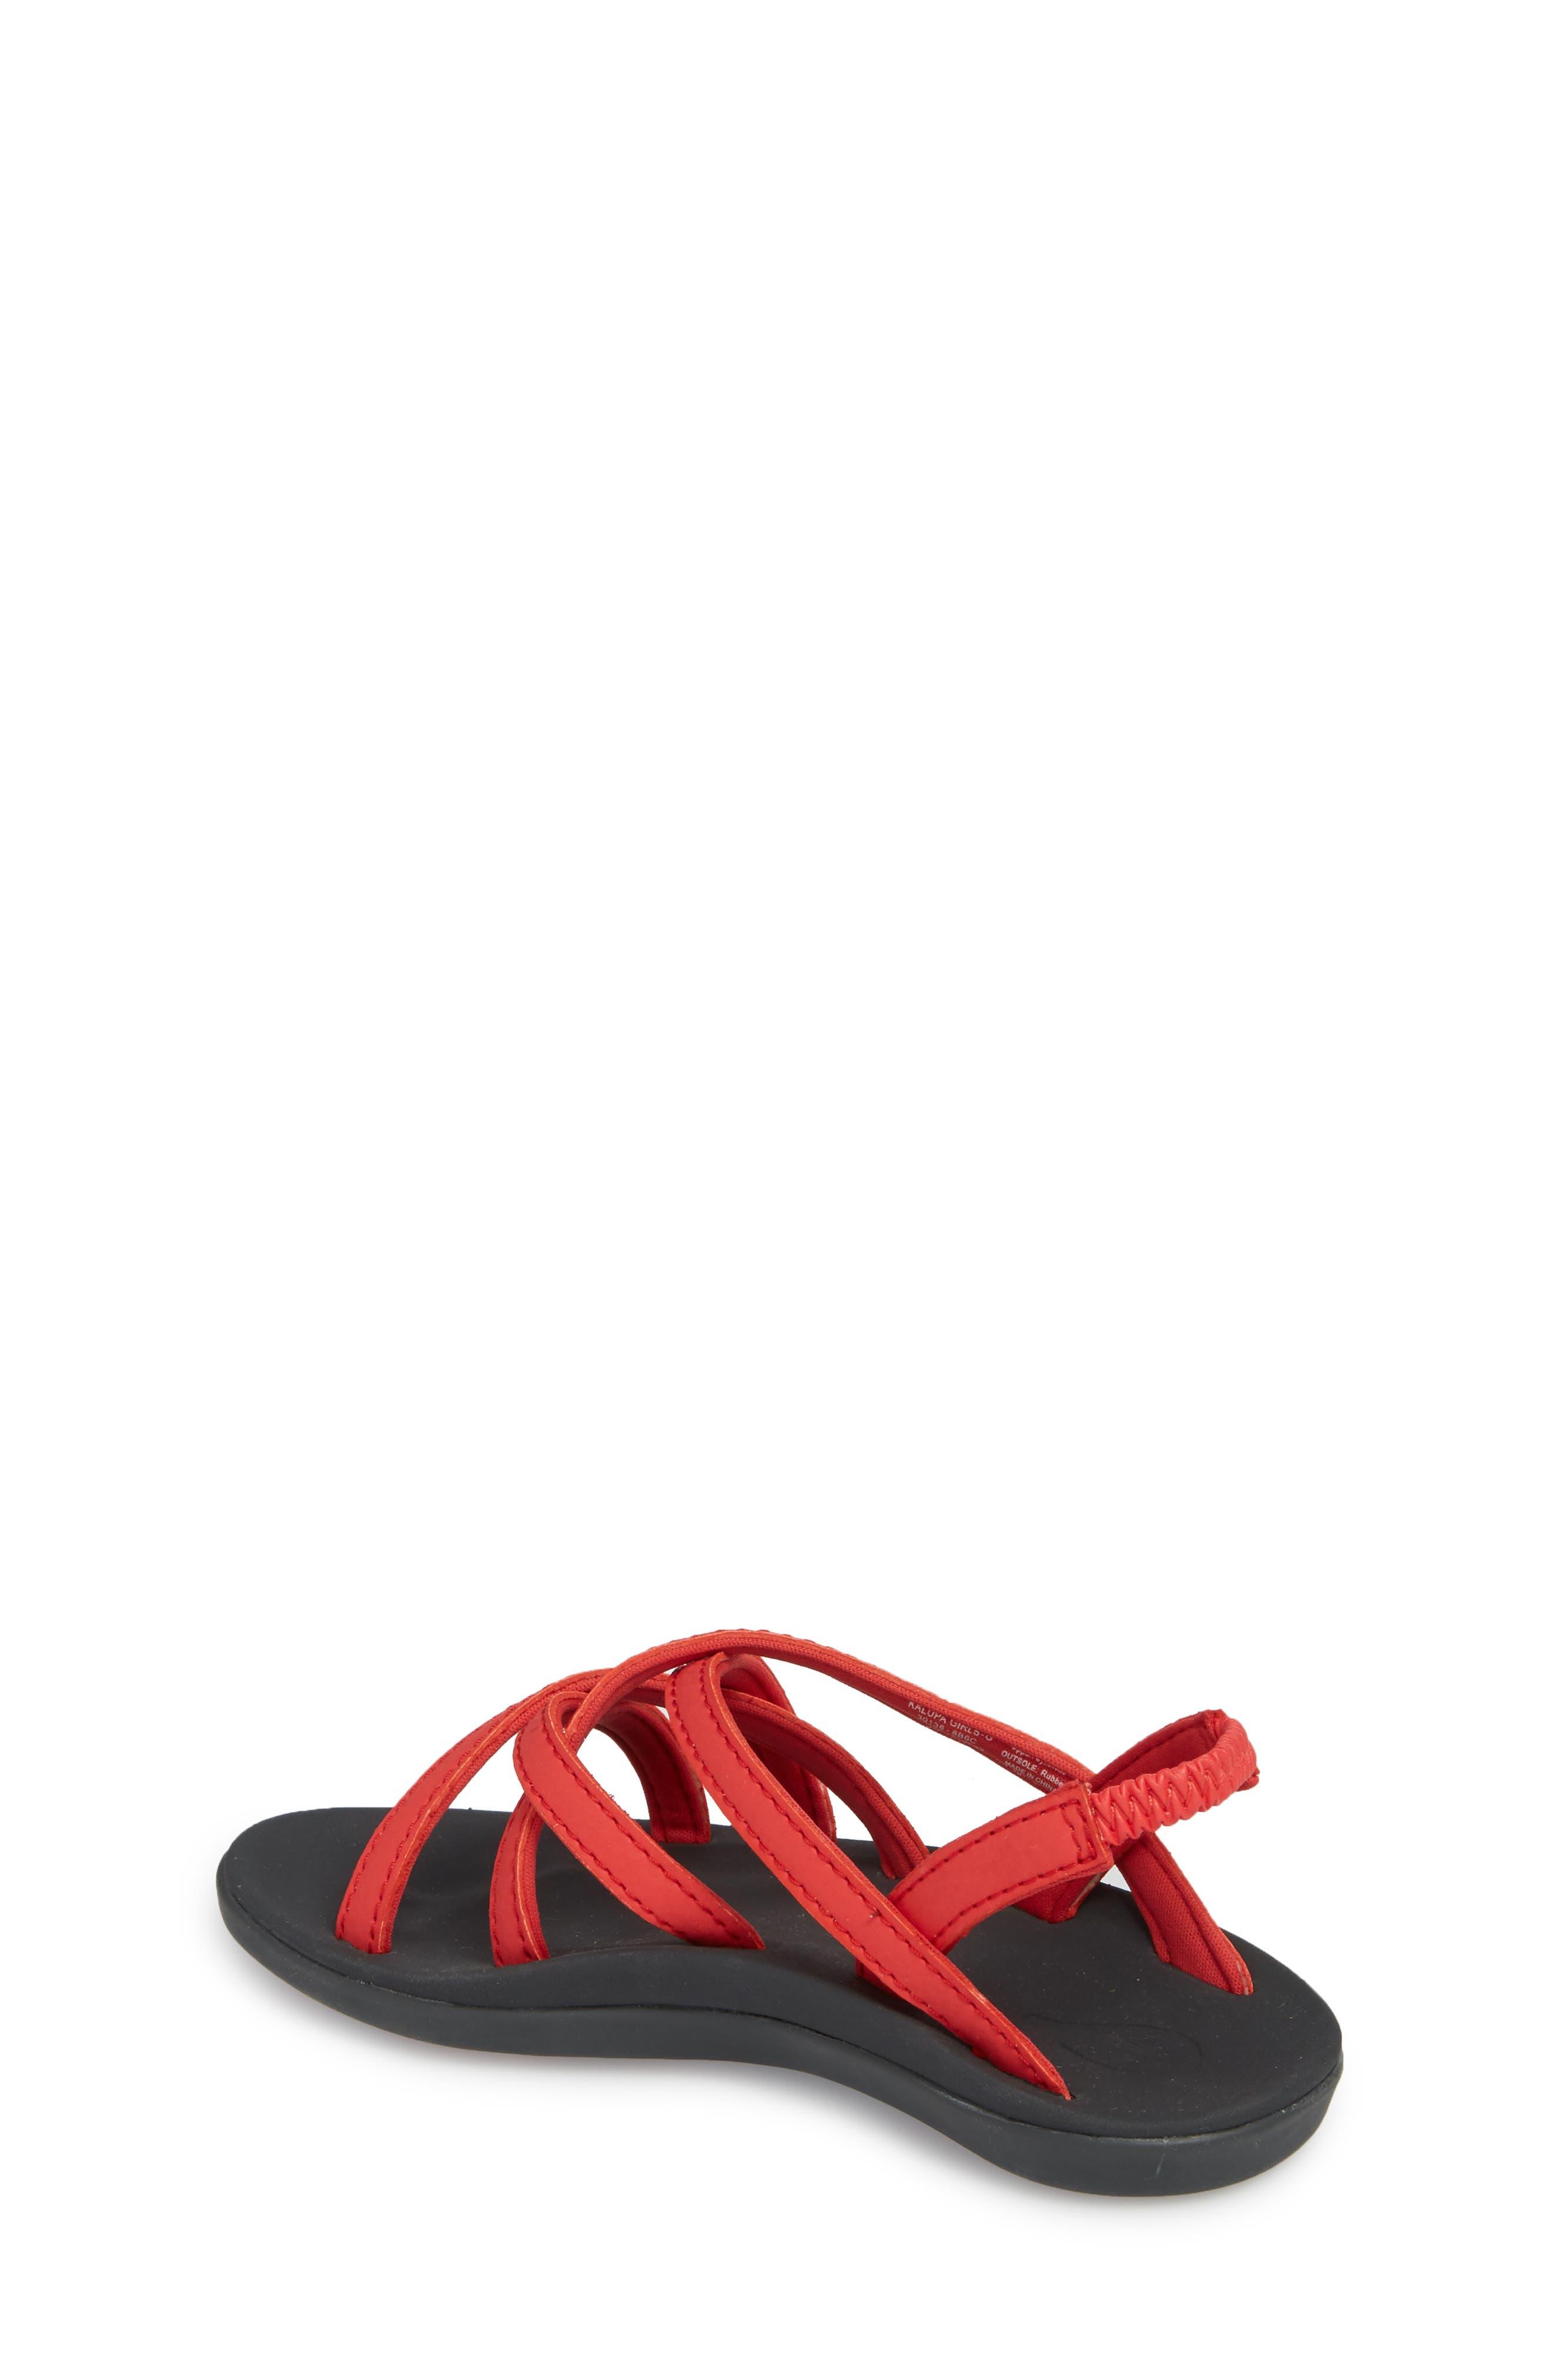 Kalapu Sandal,                             Alternate thumbnail 2, color,                             HIBISCUS/ DARK SHADOW